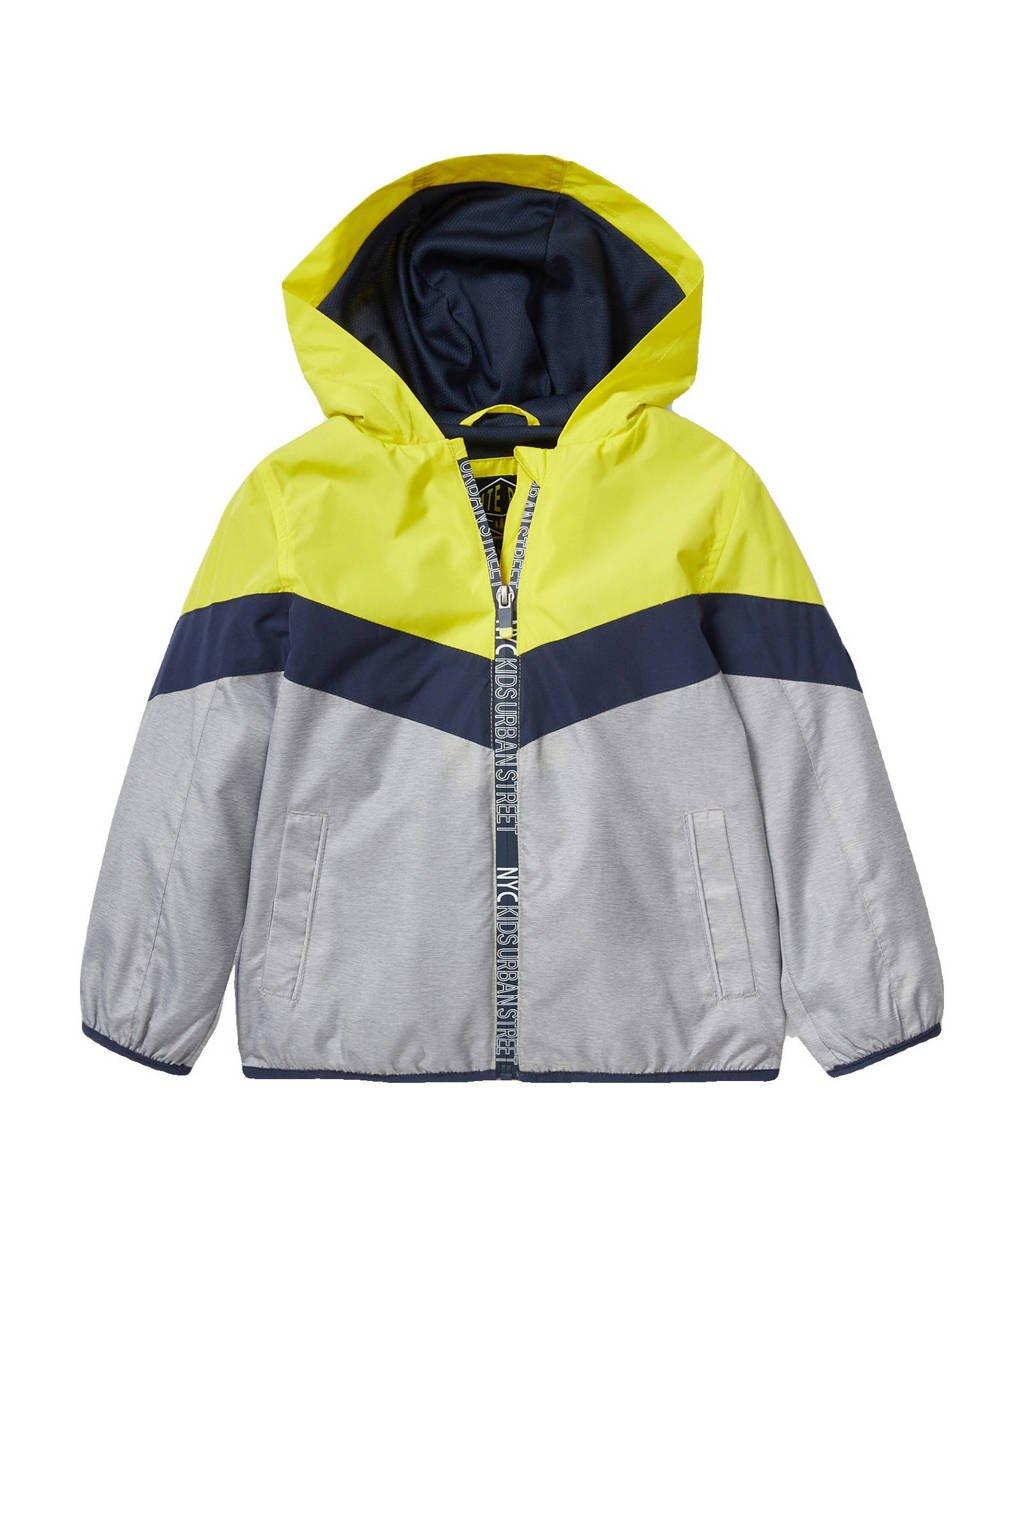 C&A Palomino  zomerjas geel/donkerblauw/lichtgrijs, Geel/donkerblauw/lichtgrijs